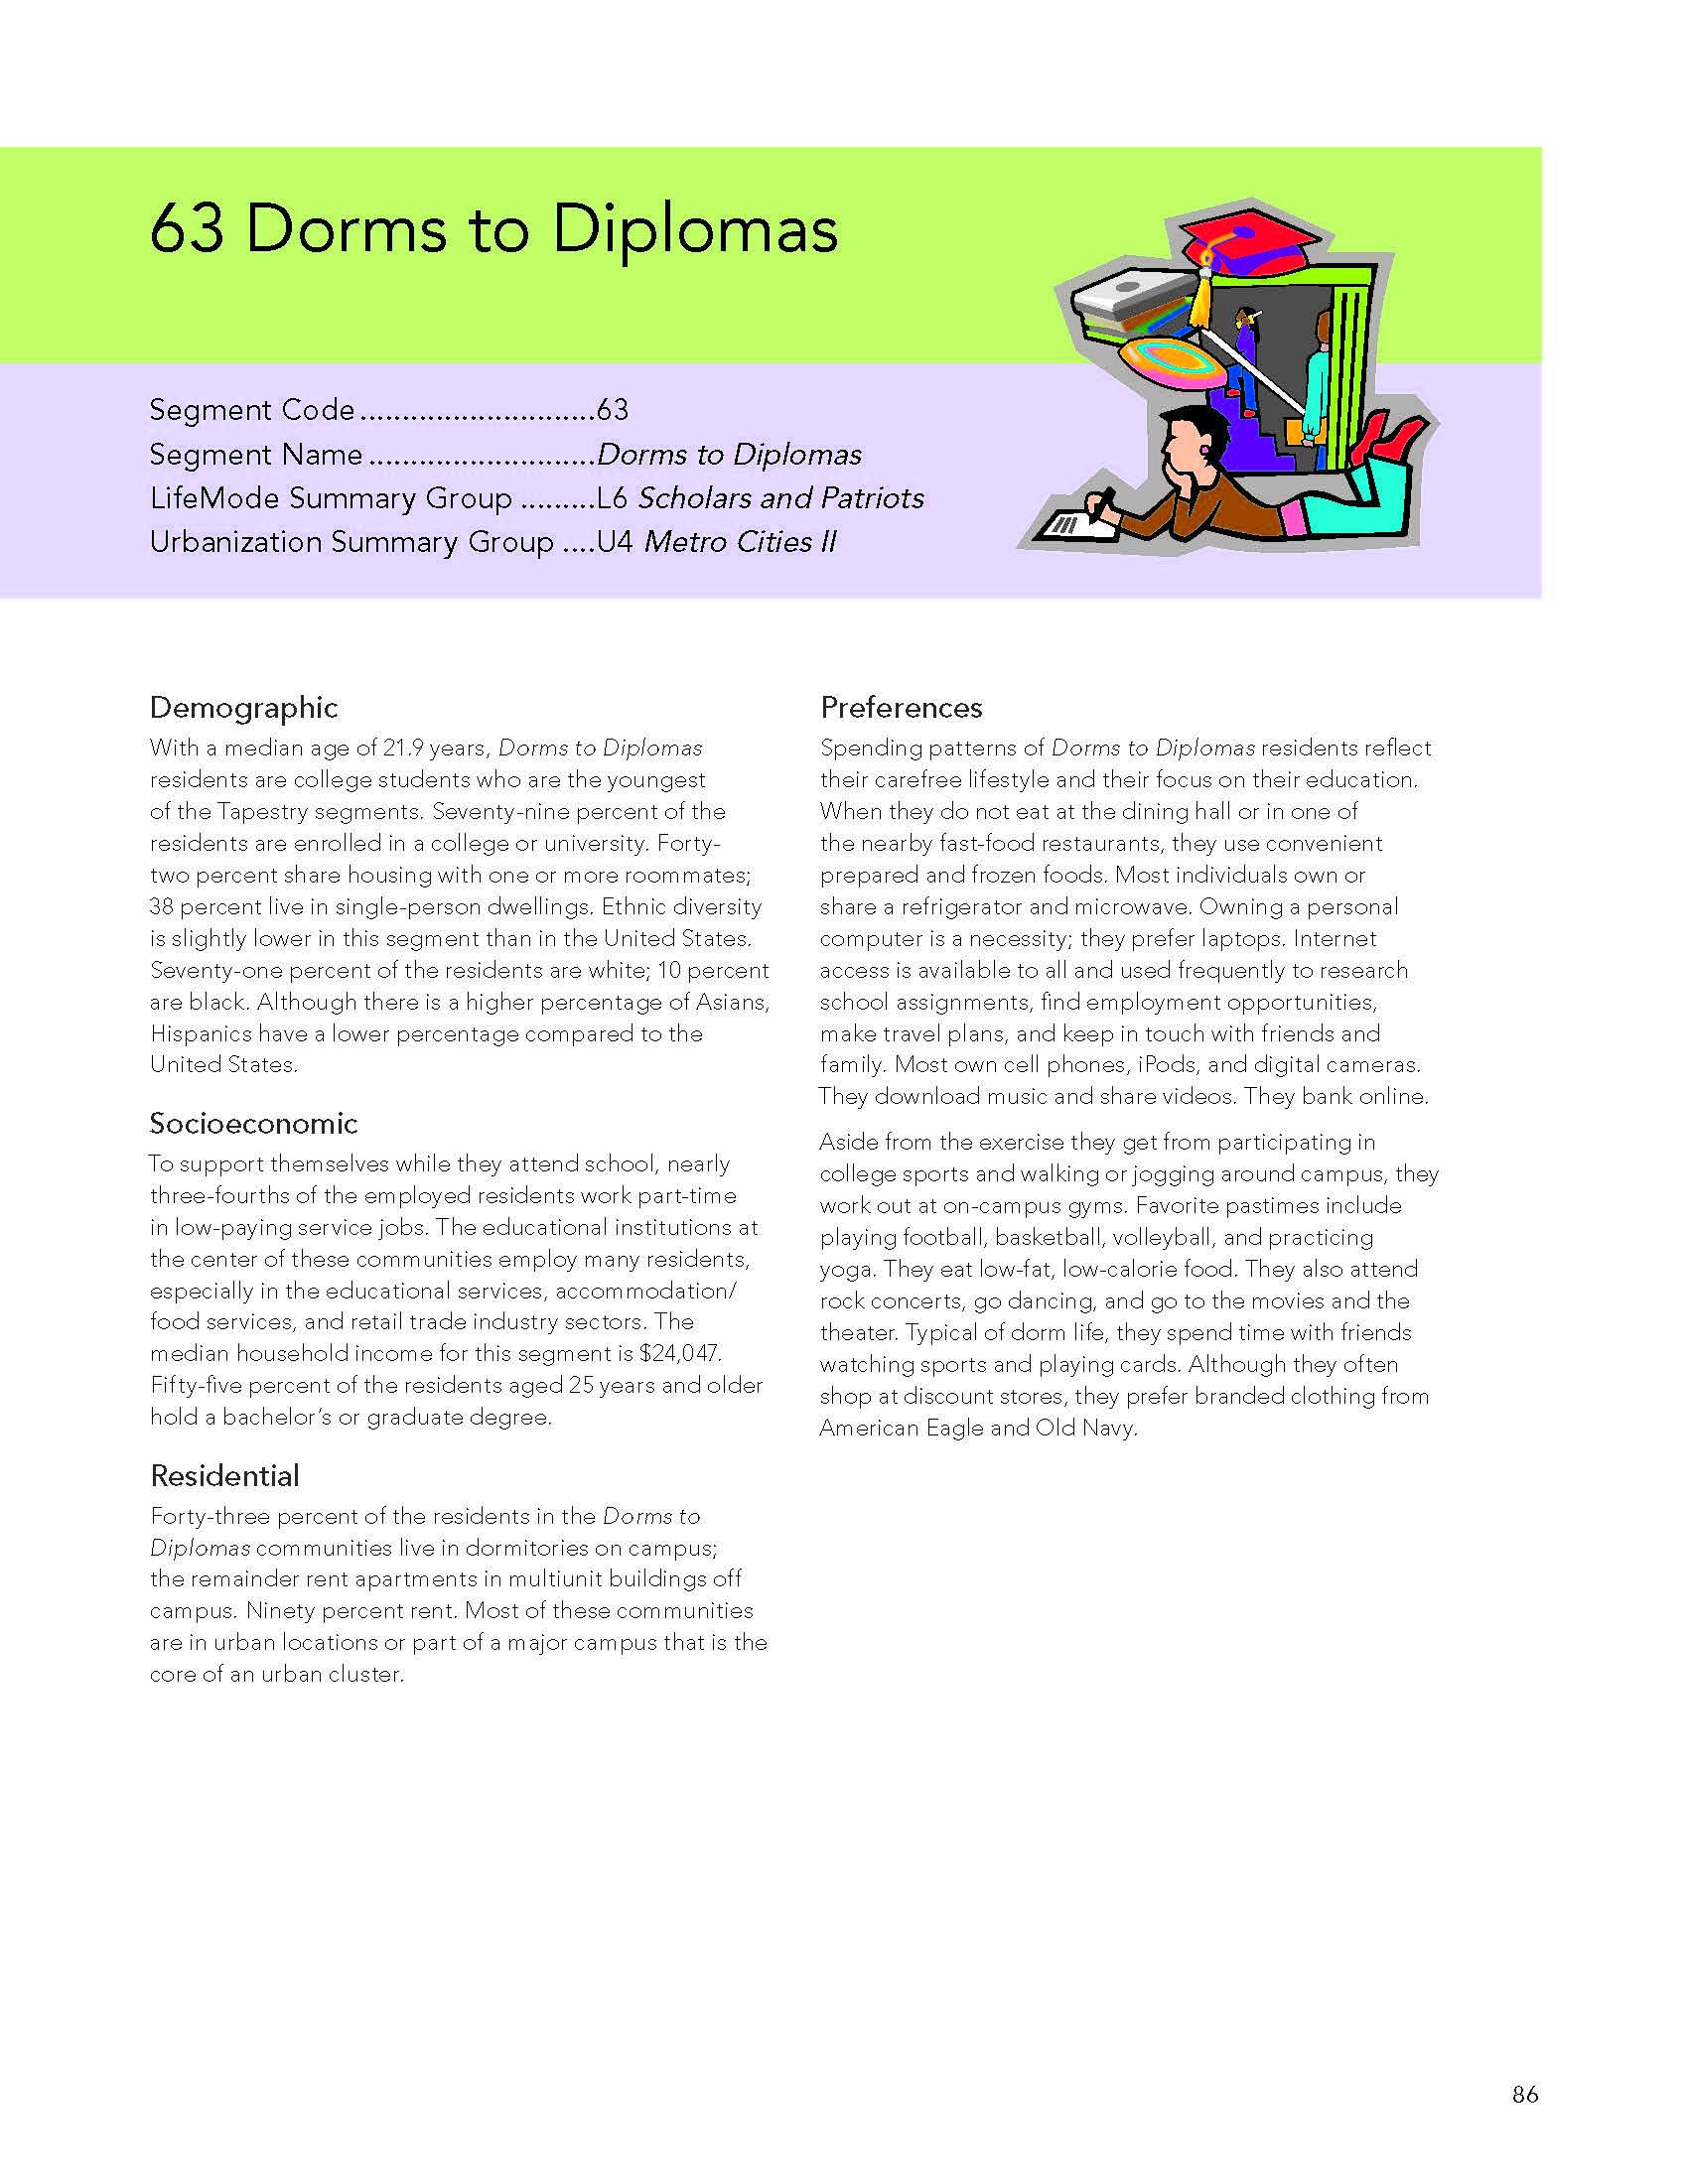 tapestry-segmentation_Page_89.jpg